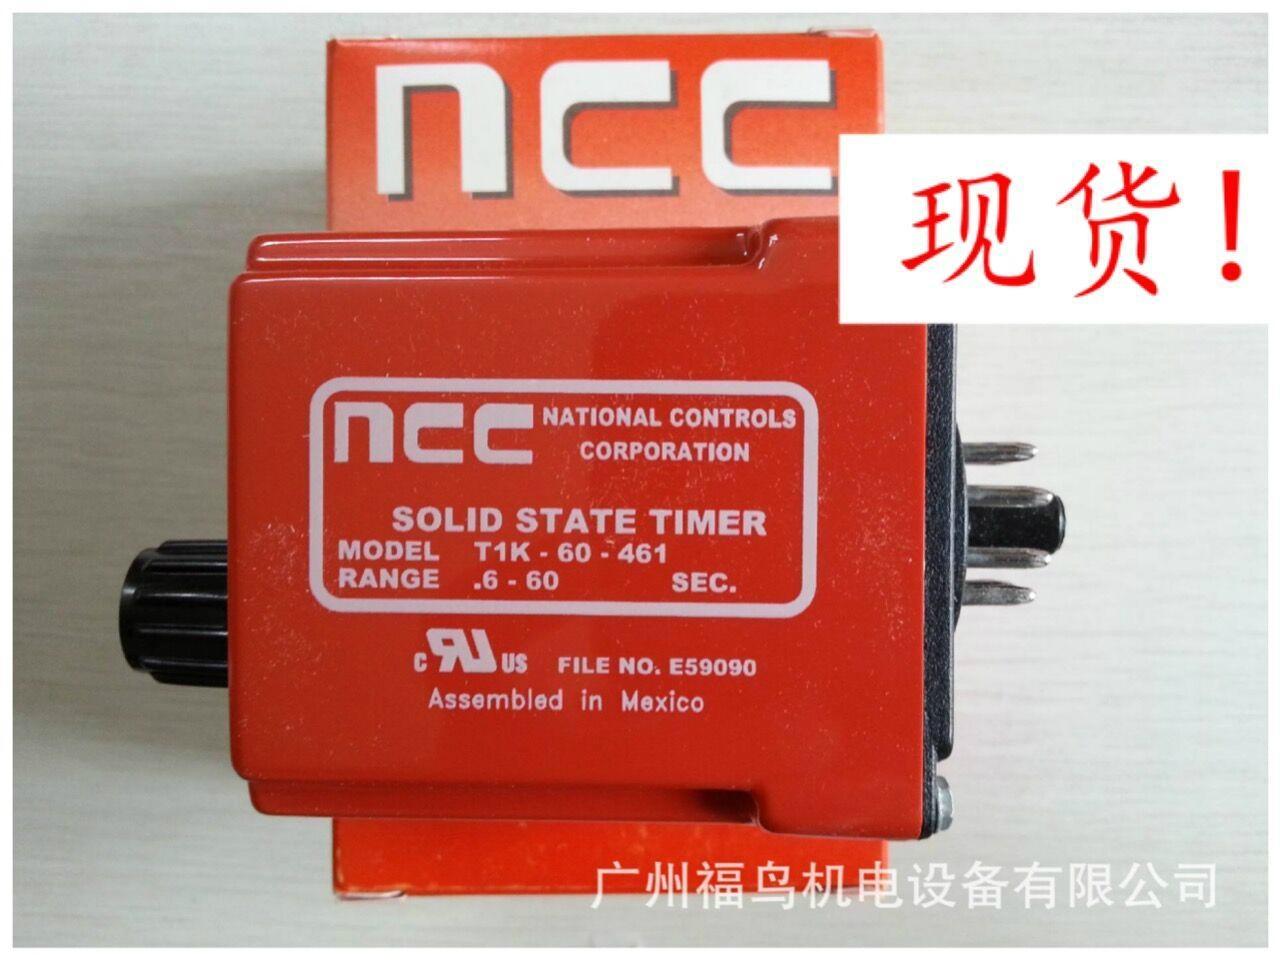 NCC延时继电器, 型号: T1K-60-461.